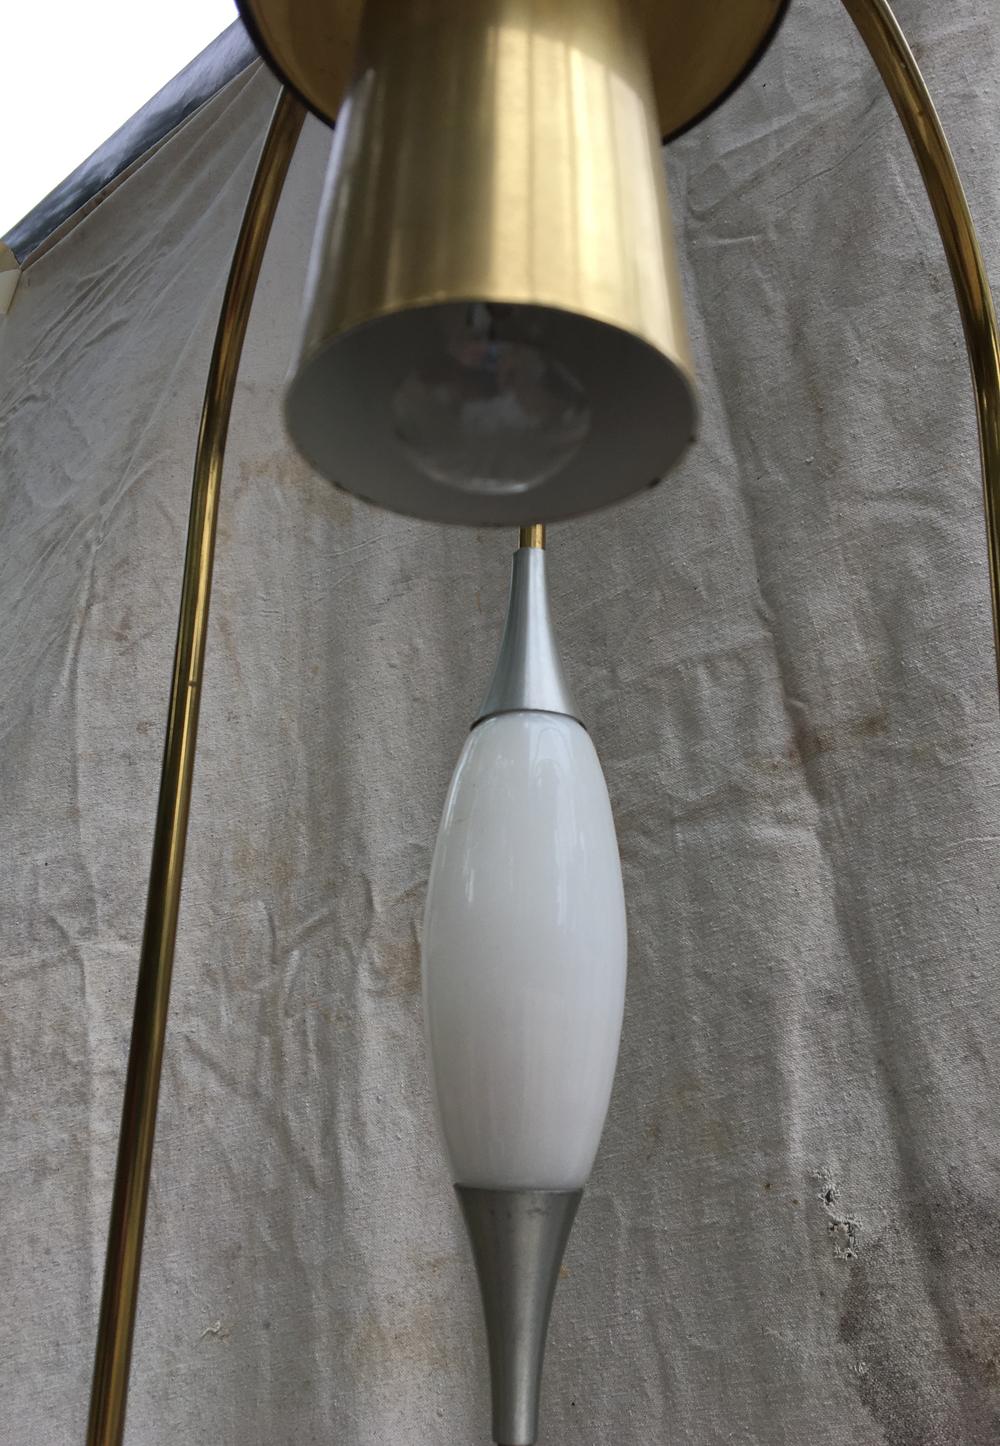 barrel floor crackerbarrel old cracker shop country p birdcage lamp metal store com